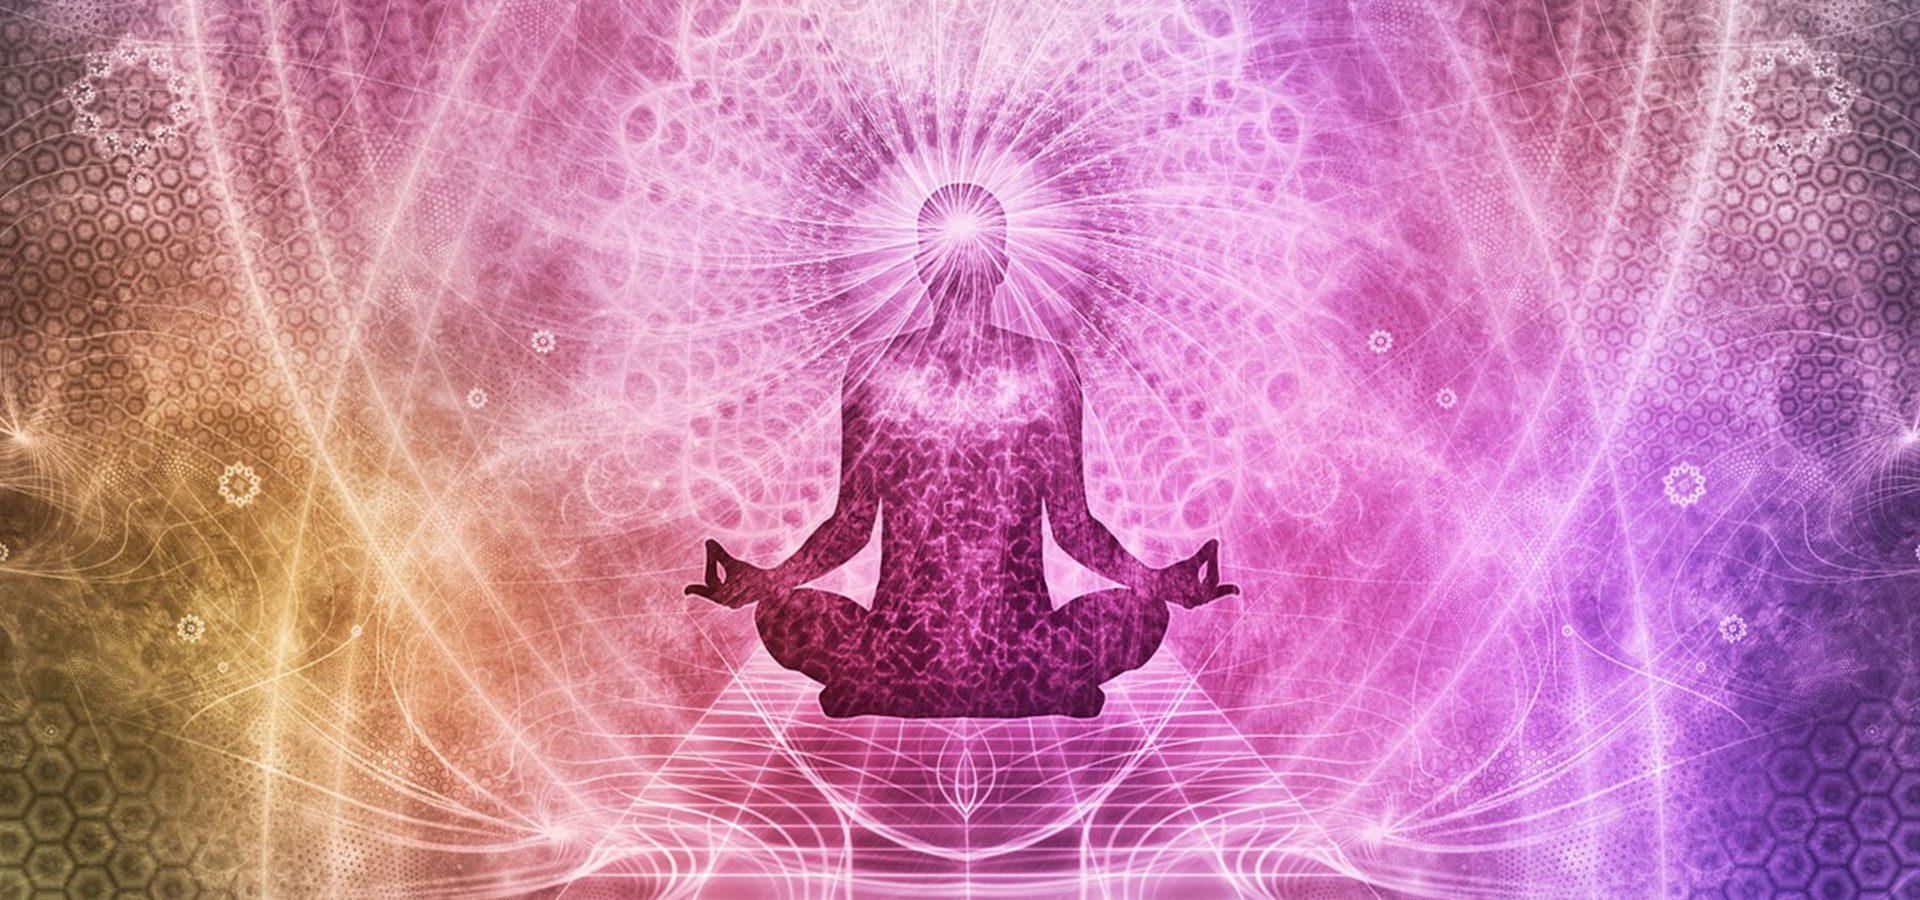 1920 x 900 purple meditation pose-60lower